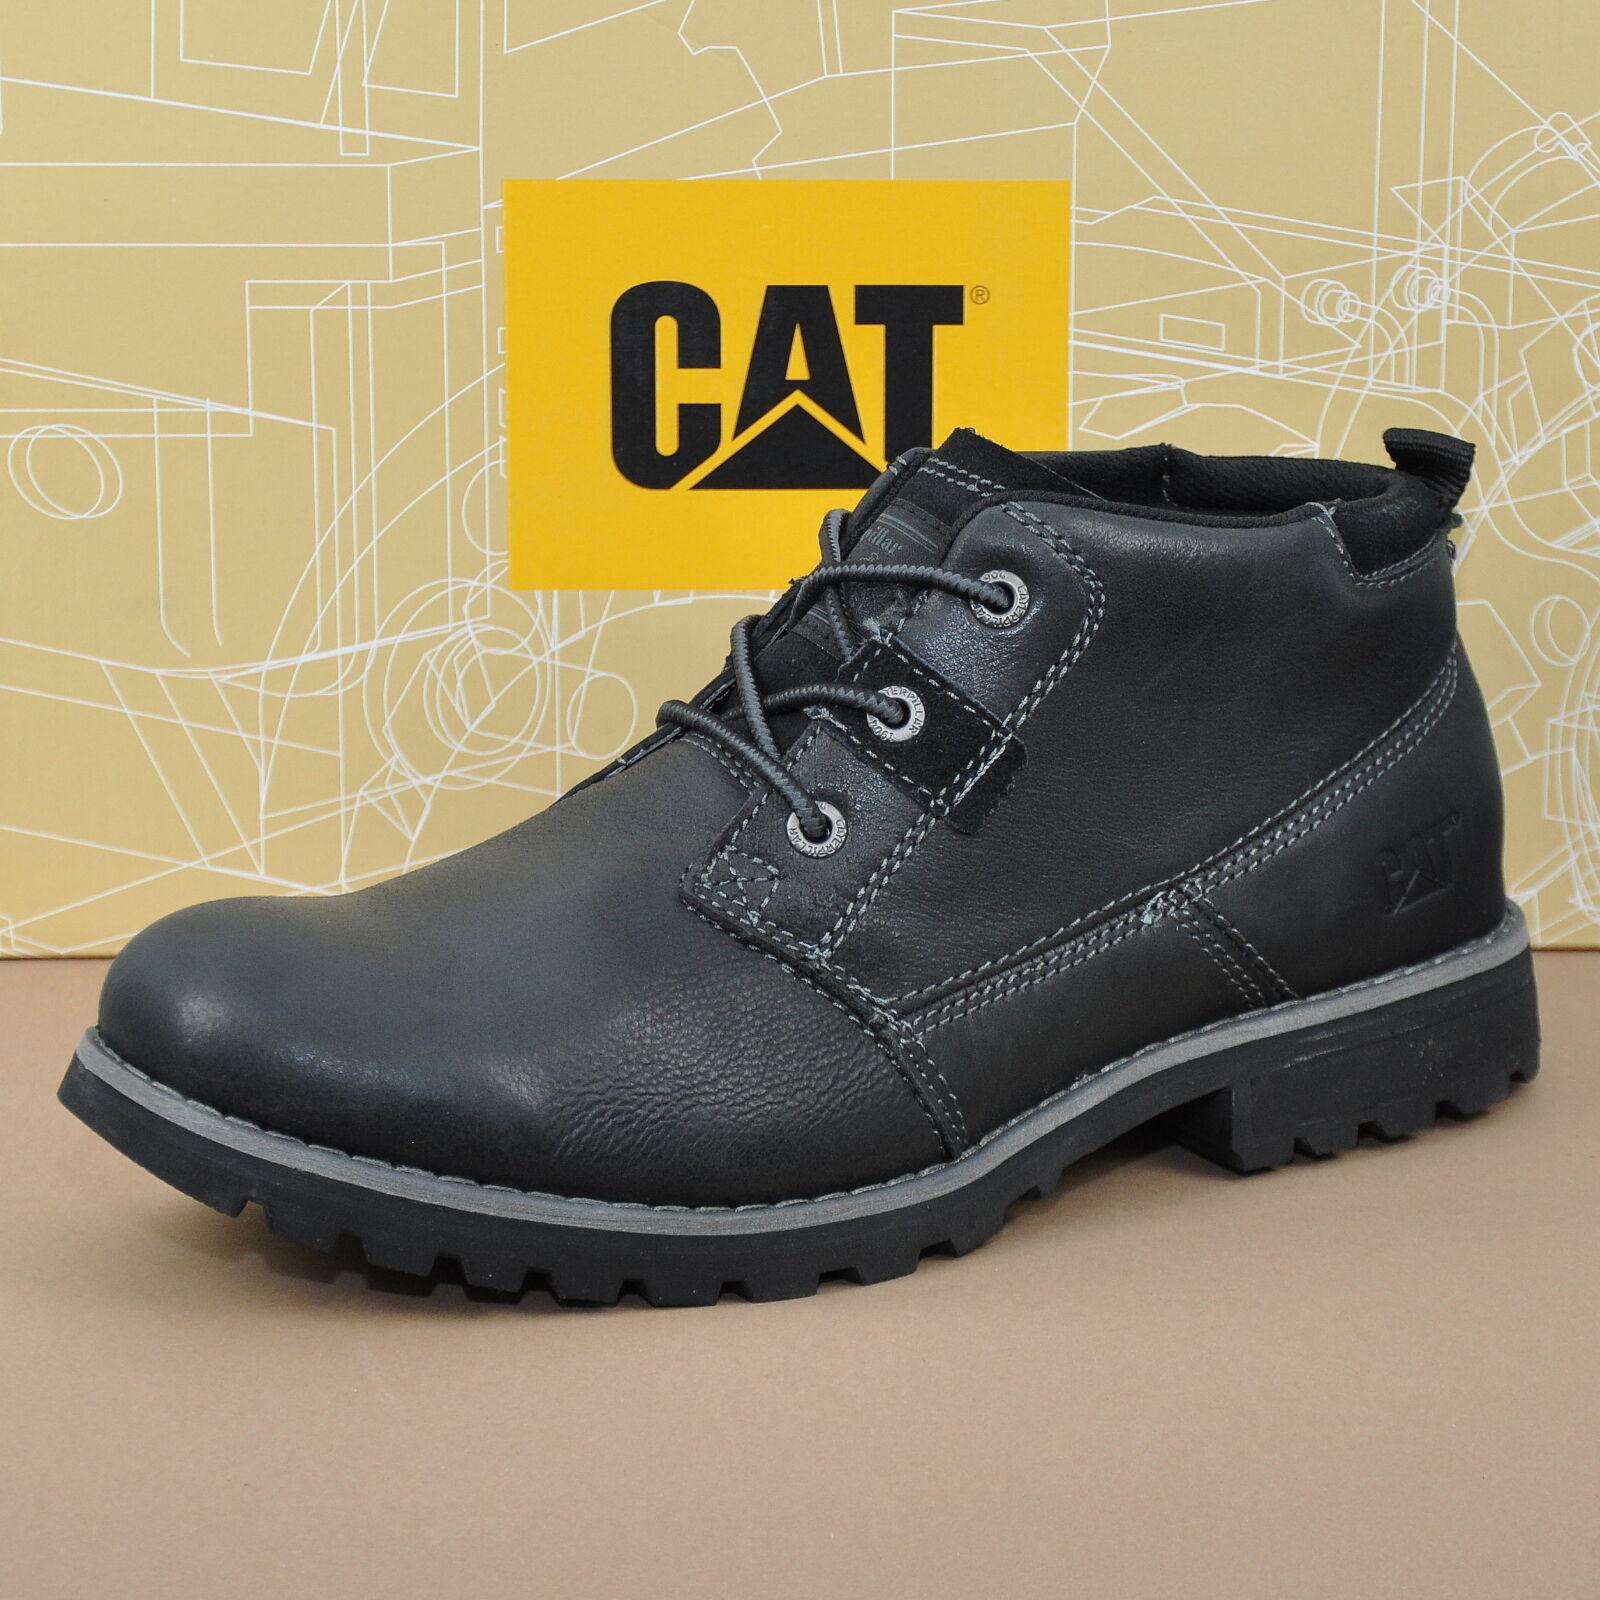 Caterpillar CAT Footwear Harold Herren Boots Leder Schuhe Stiefel Black P718500